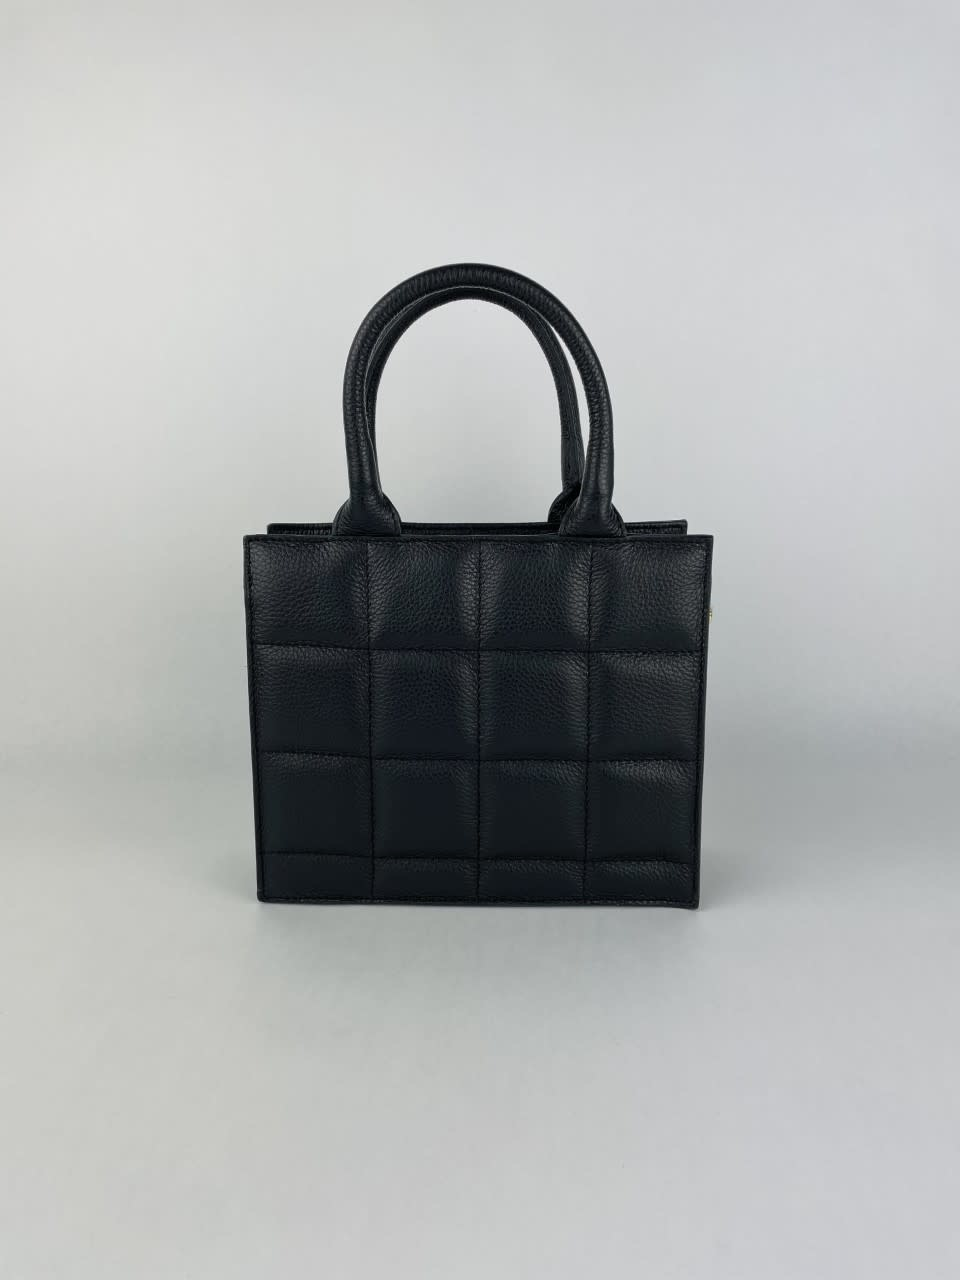 Metora leather bag Black-1